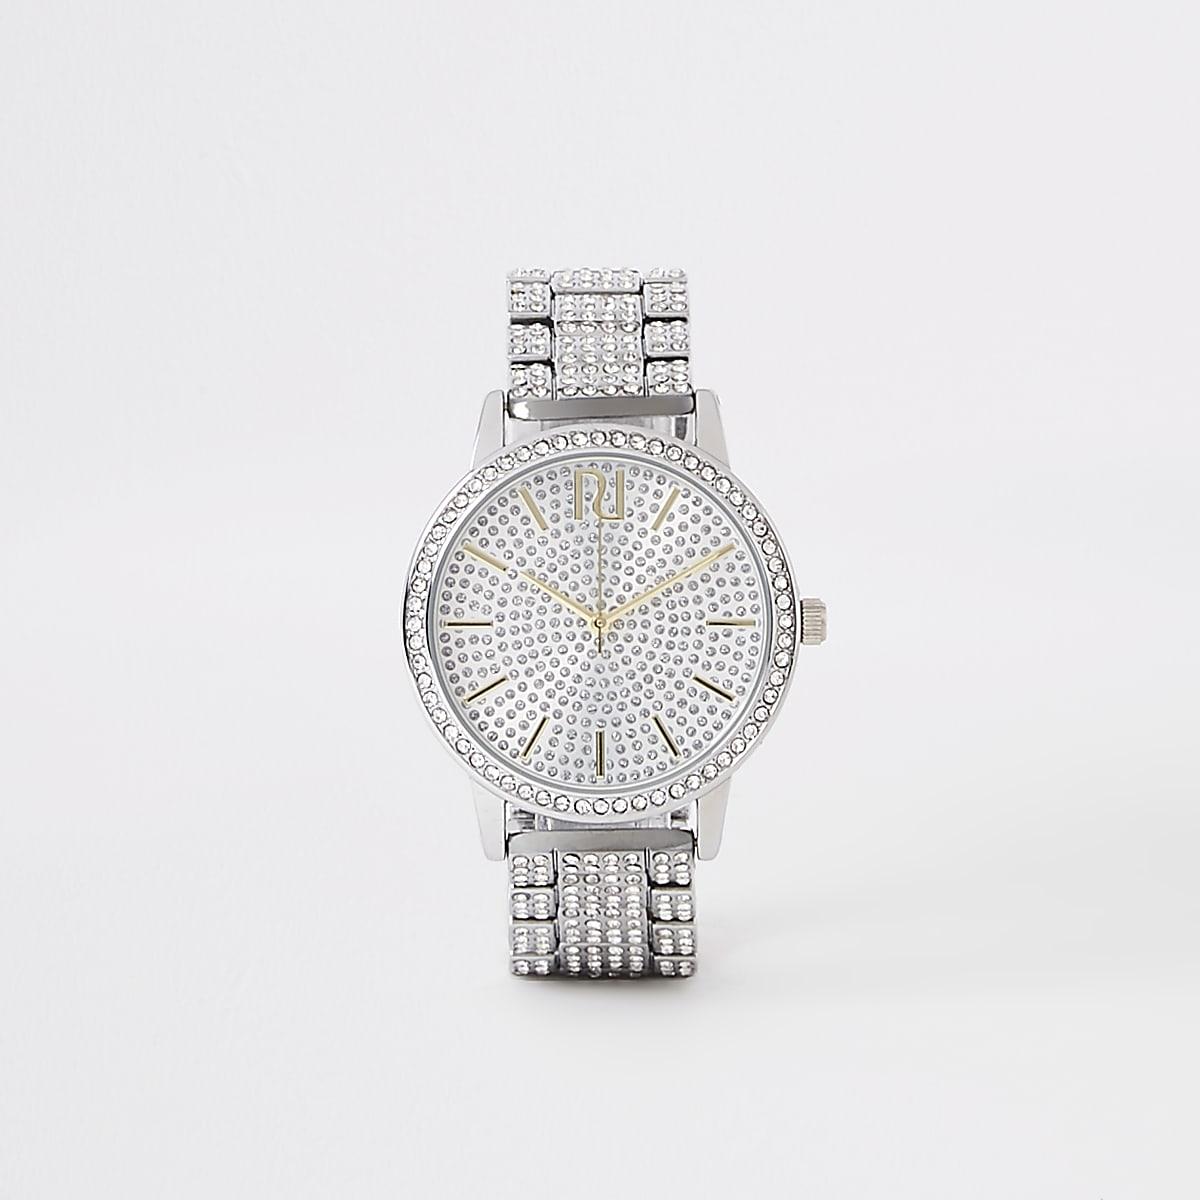 Silver rhinestone pave chain link watch